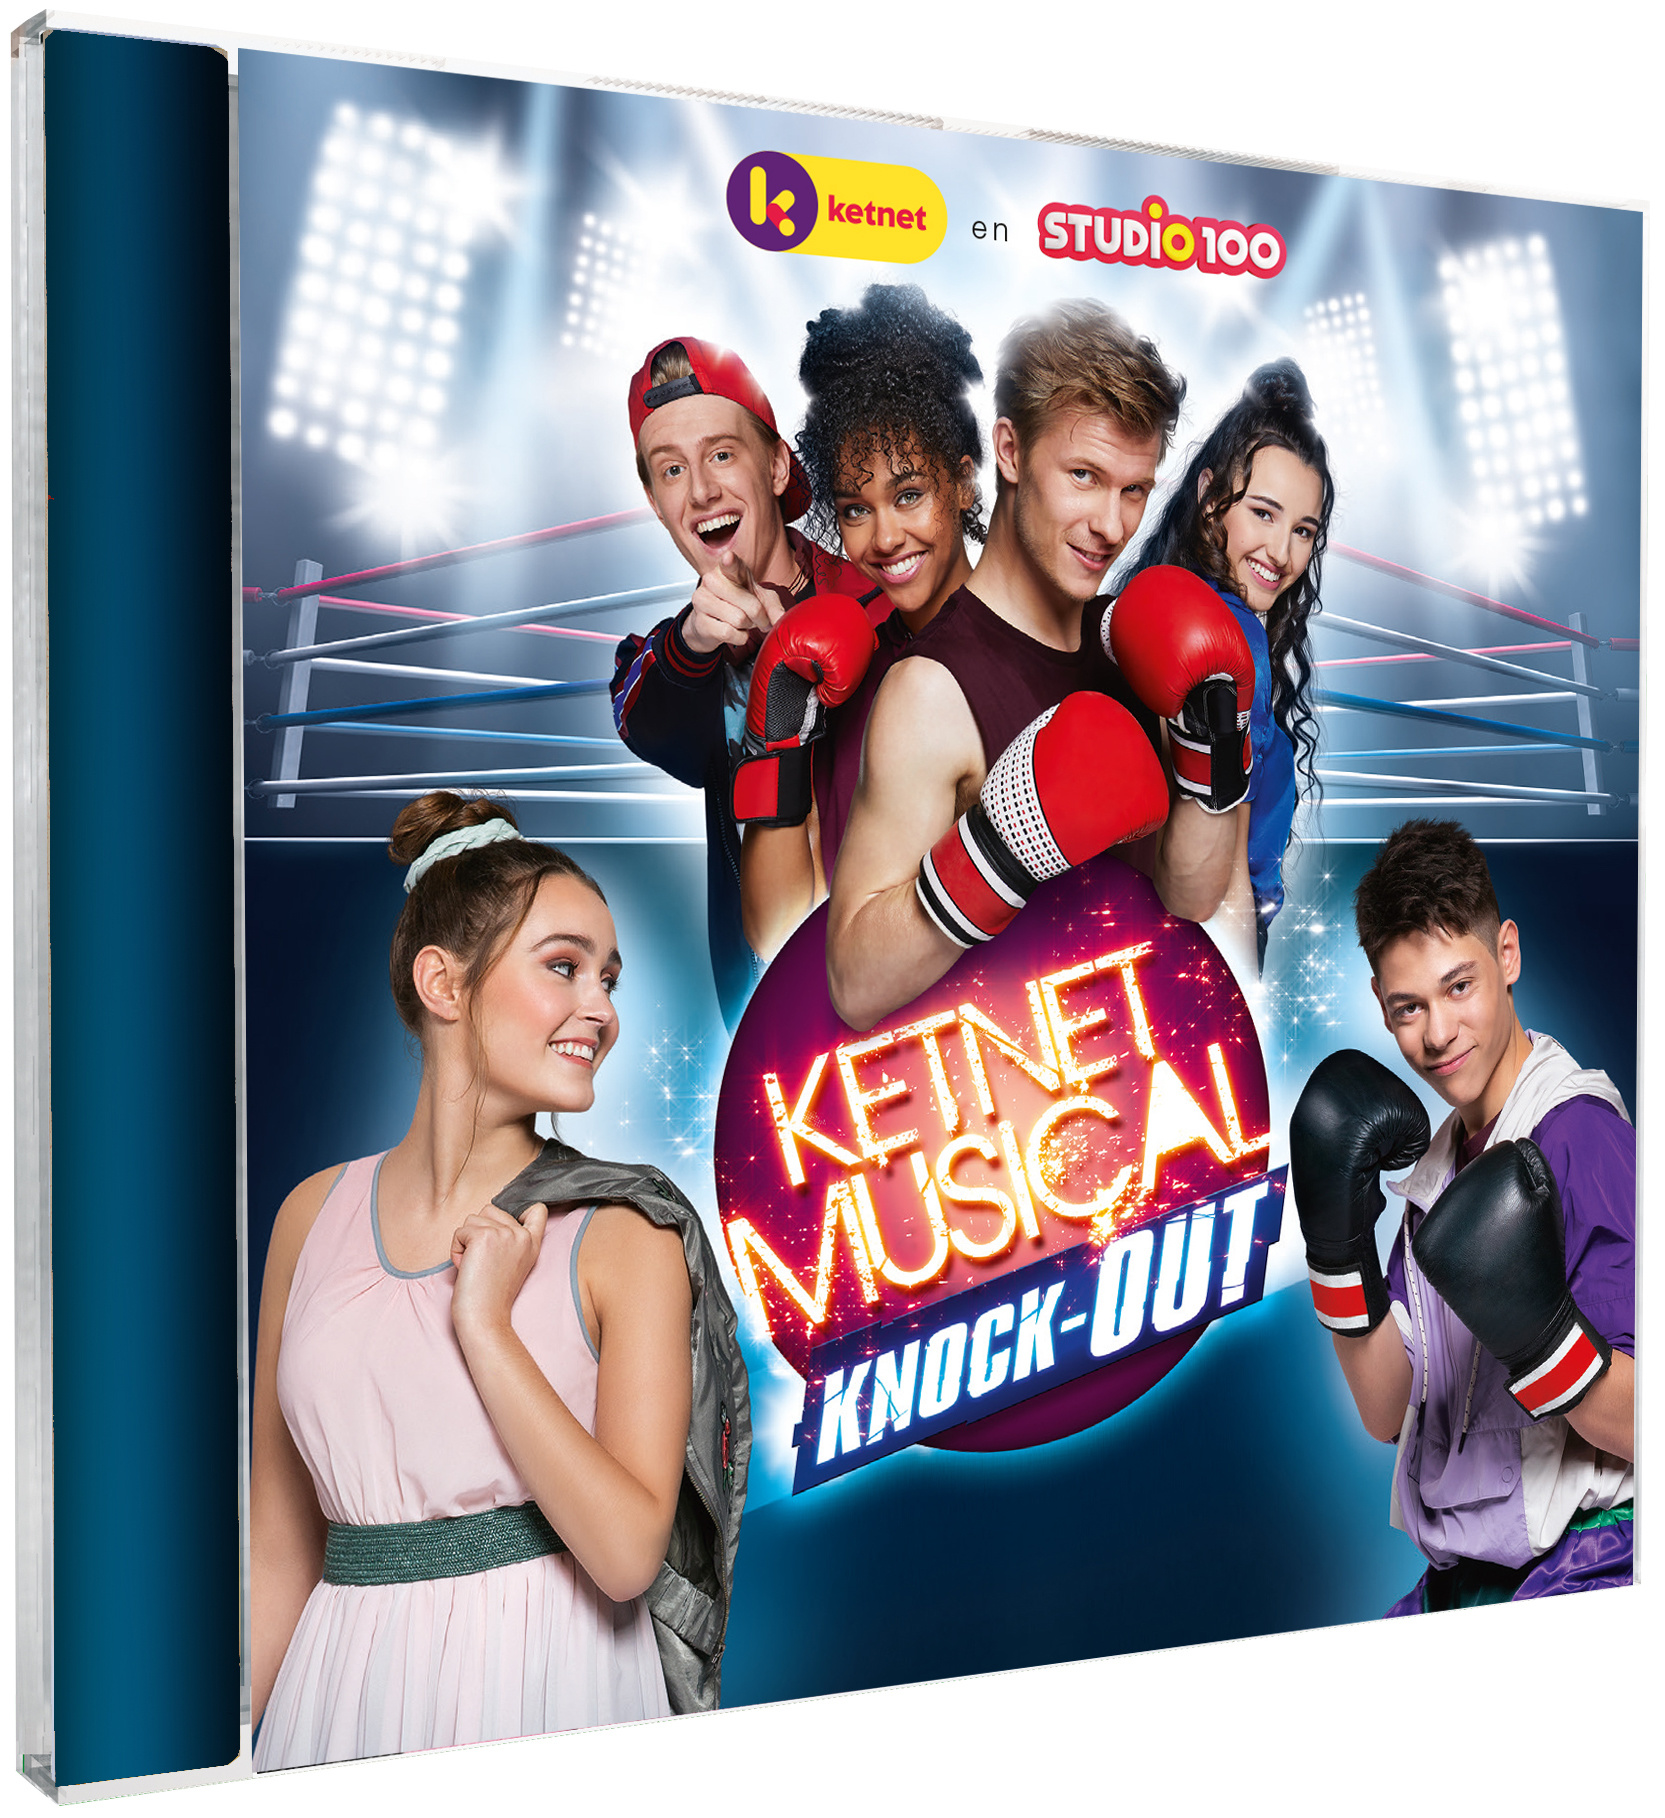 Cd Studio 100: Ketnet musical - Knock out